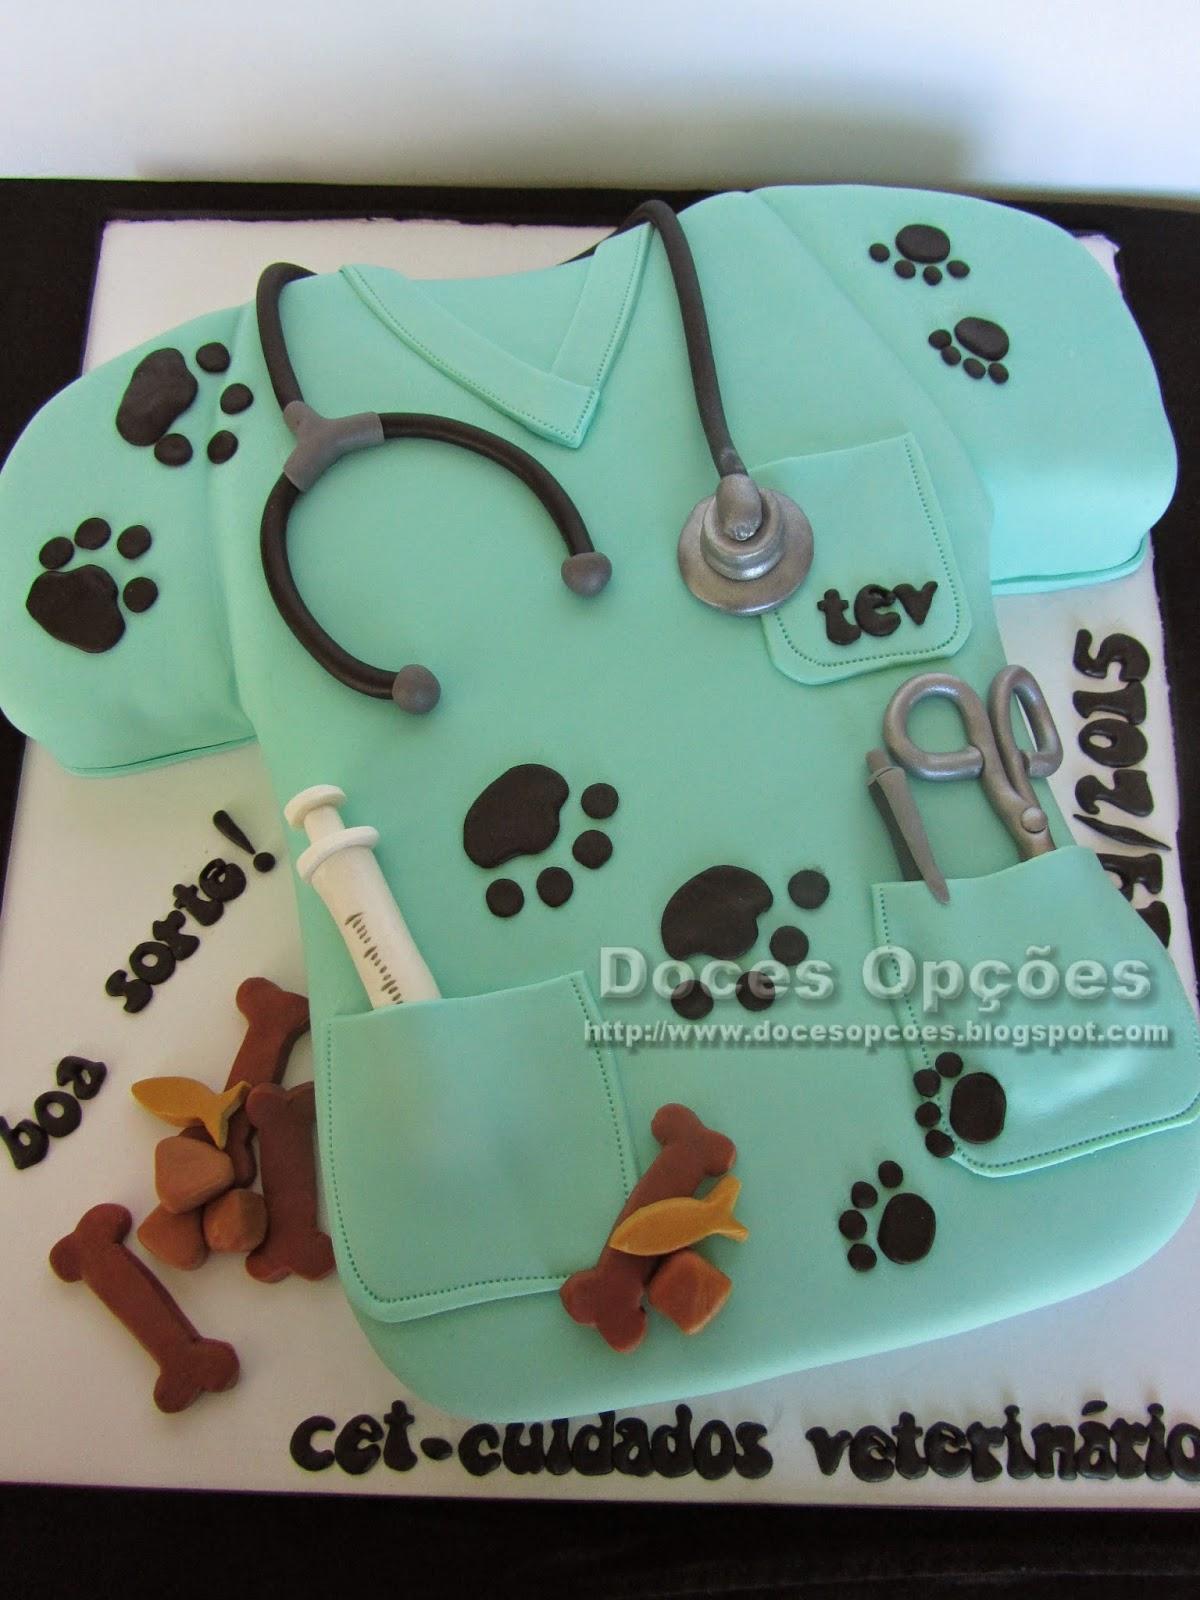 bolo tev cet cuidados veterinário 2014/2015 esab ipb